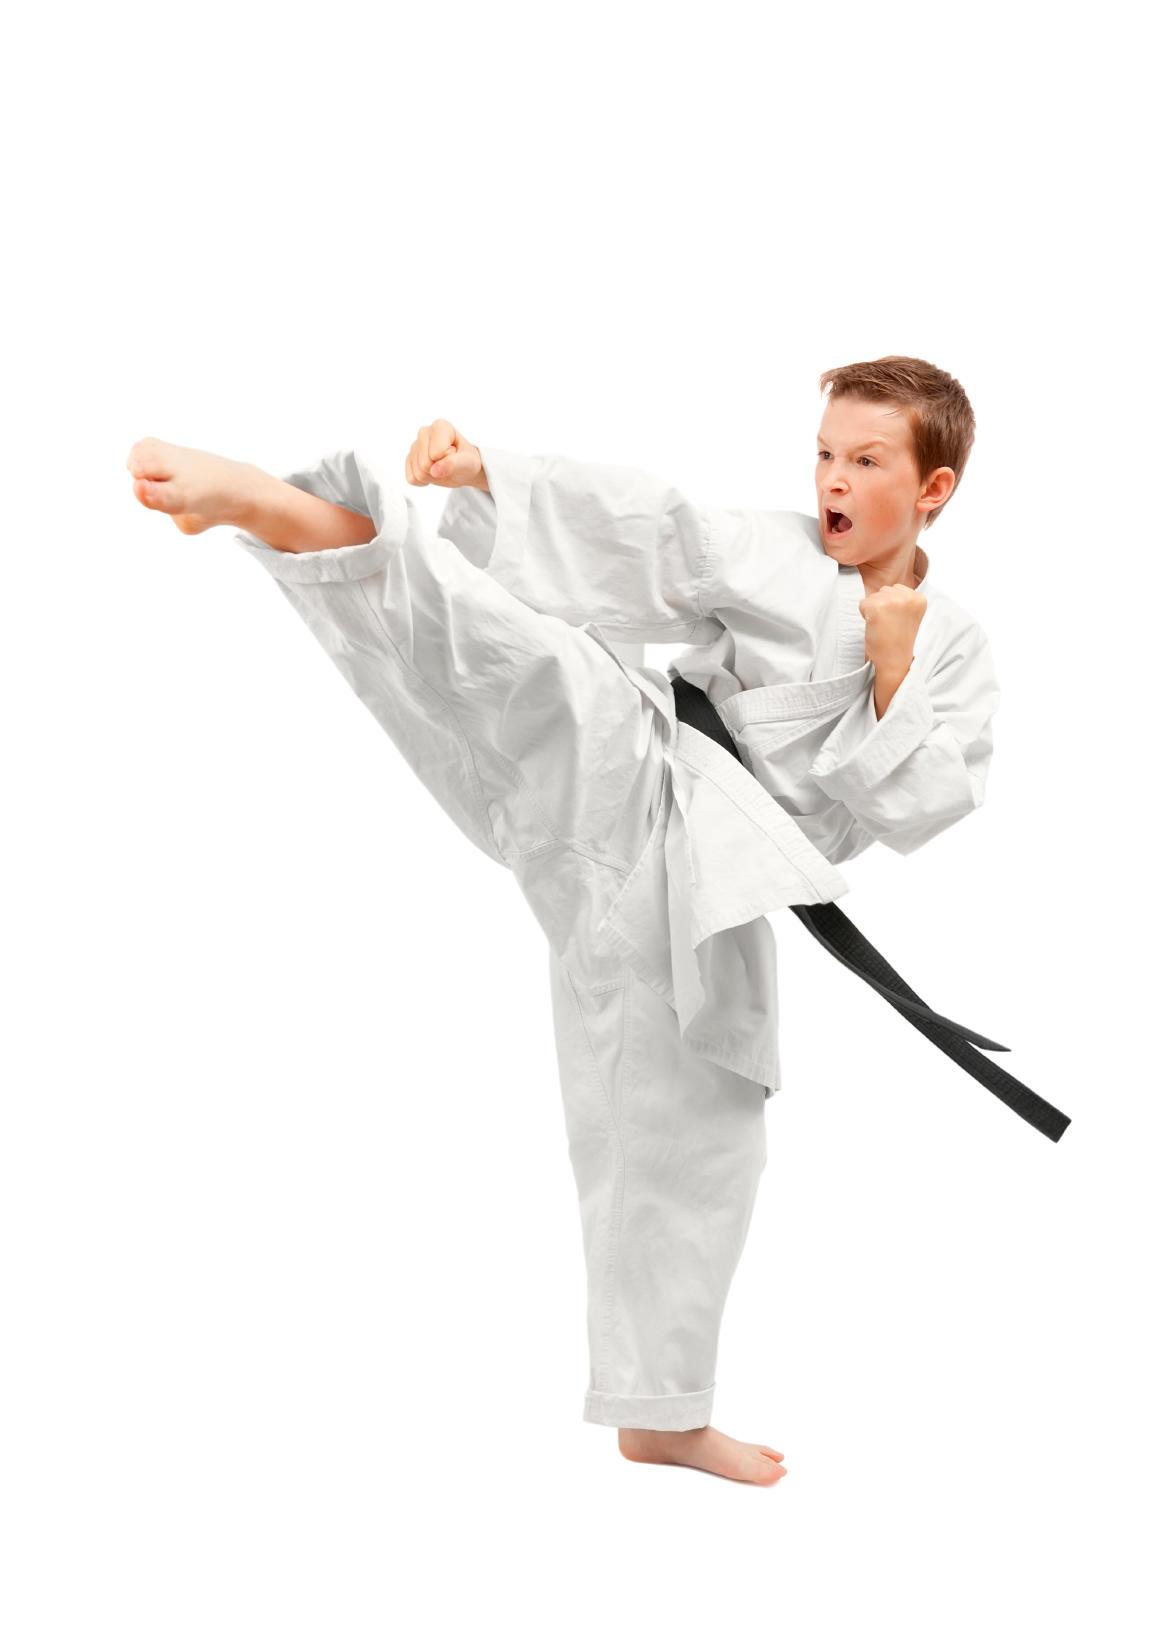 Millennium Martial Arts - Tae Kwon Do image 31